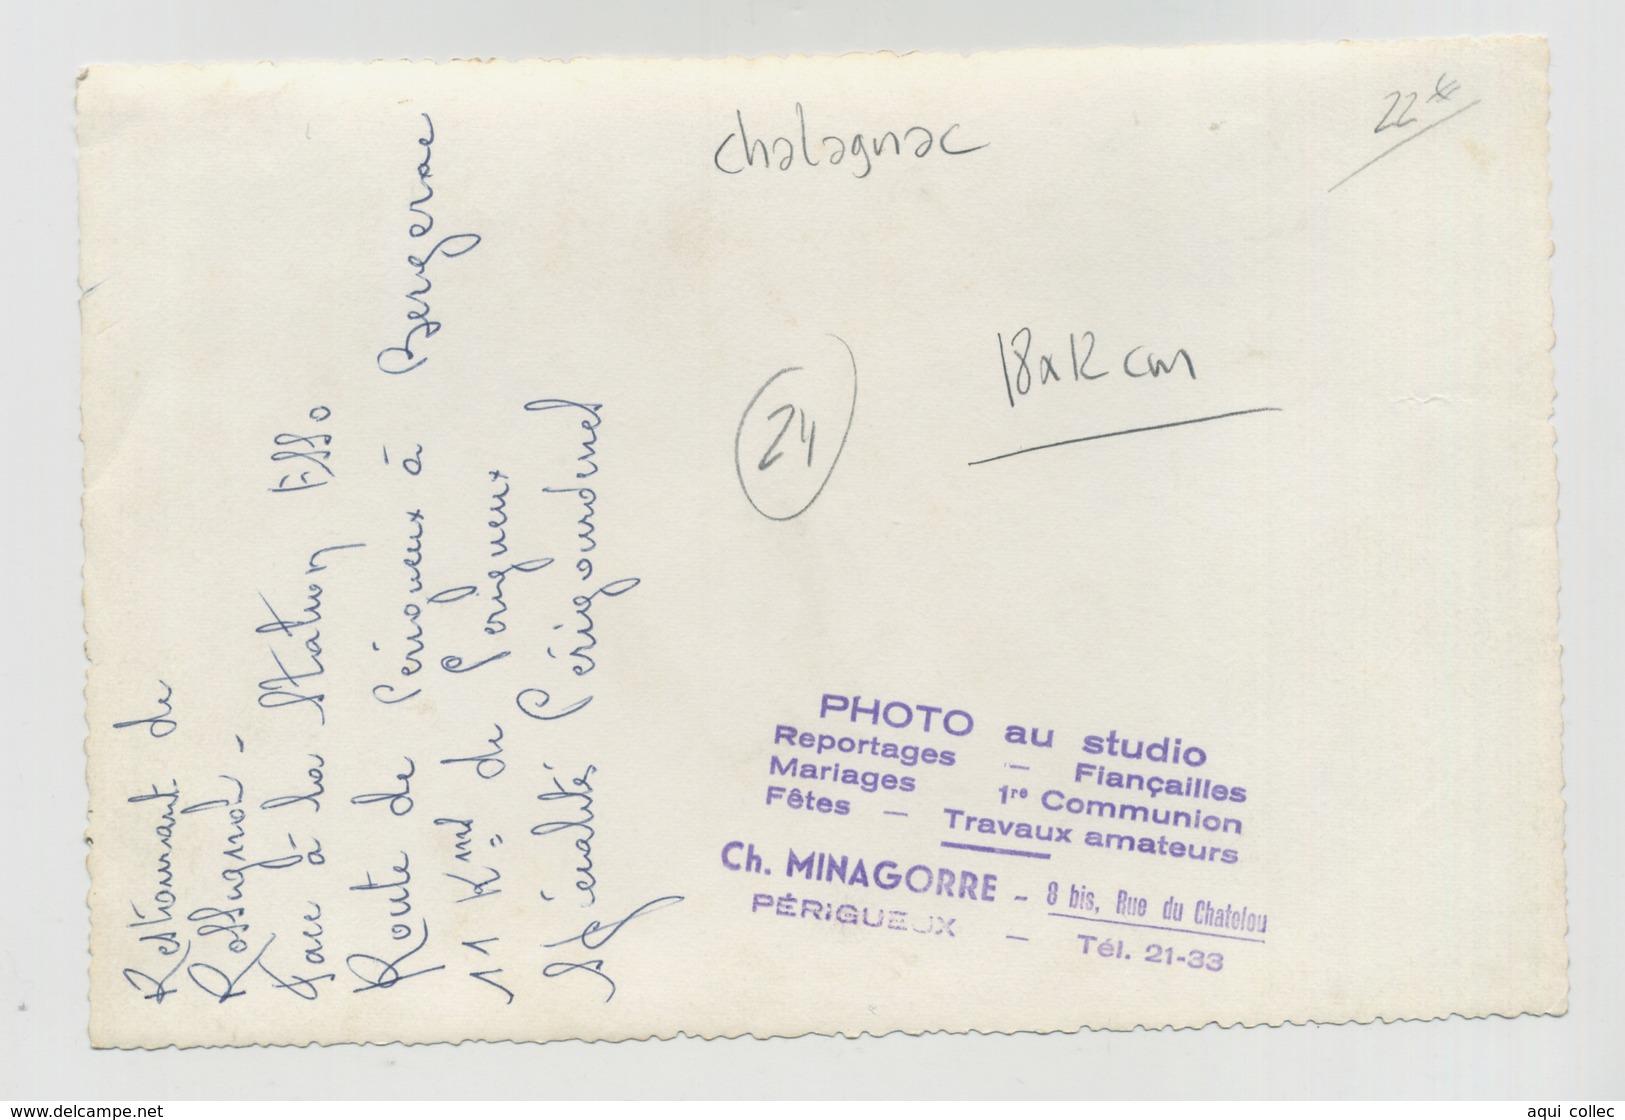 CHALAGNAC   24 PERIGORD DORDOGNE  PHOTO 18*12 CM  RESTAURANT ROSSIGNOL - France